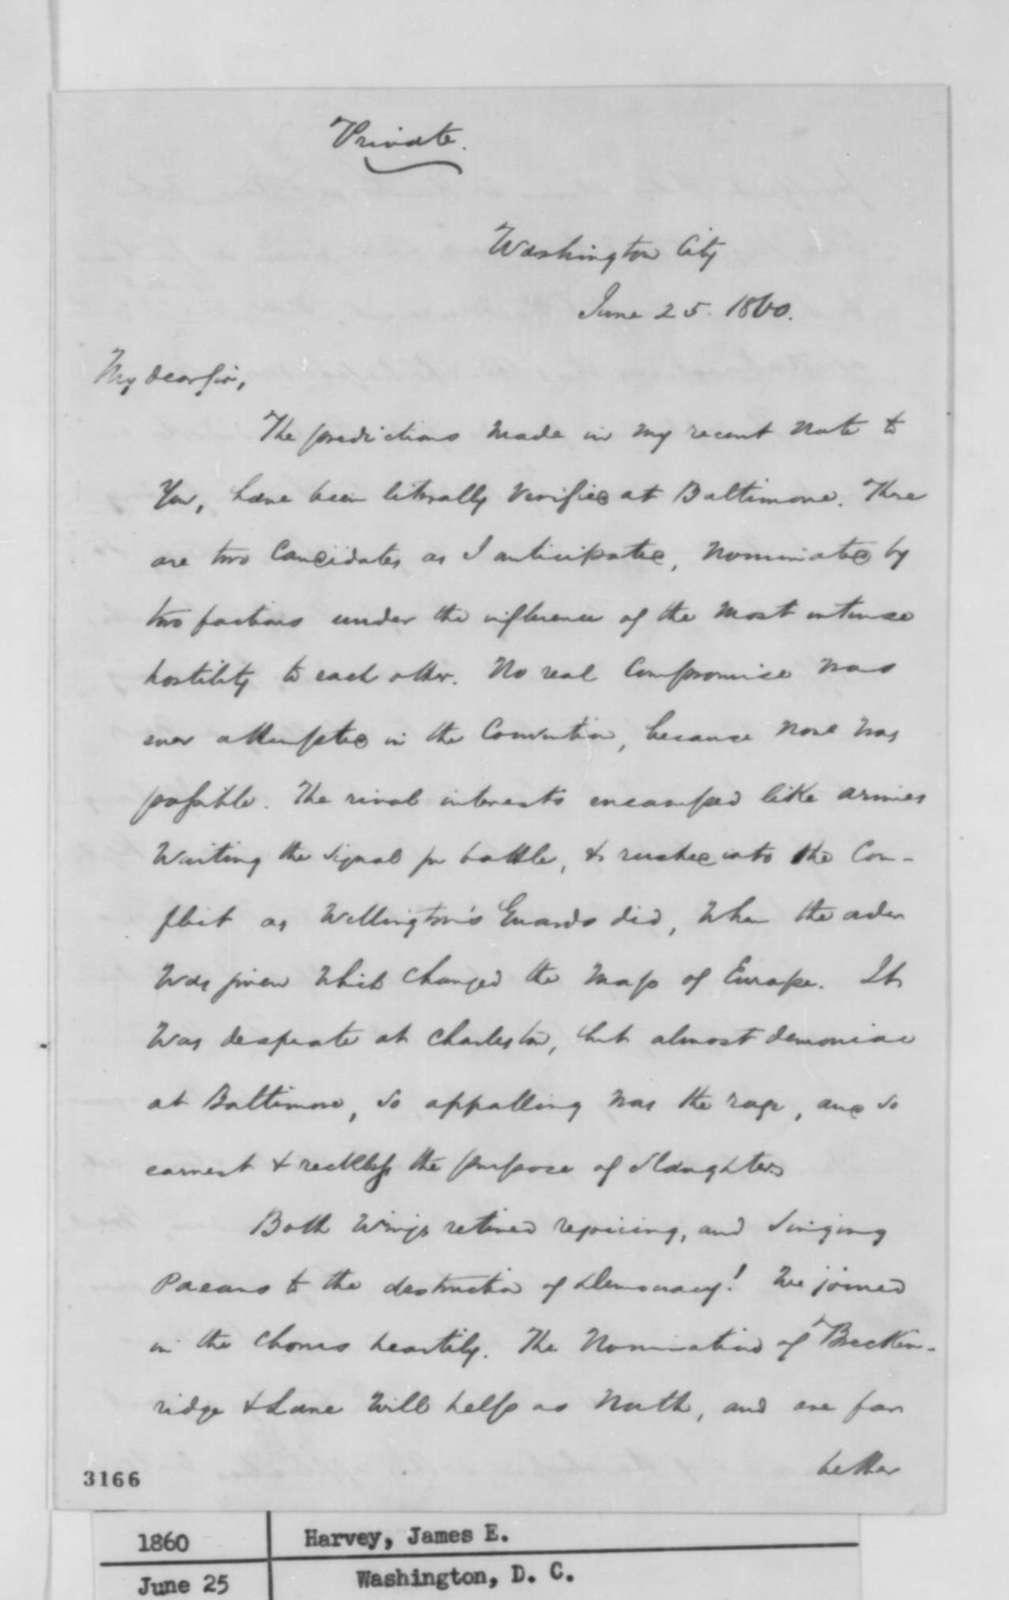 James E. Harvey to Abraham Lincoln, Monday, June 25, 1860  (Baltimore convention)